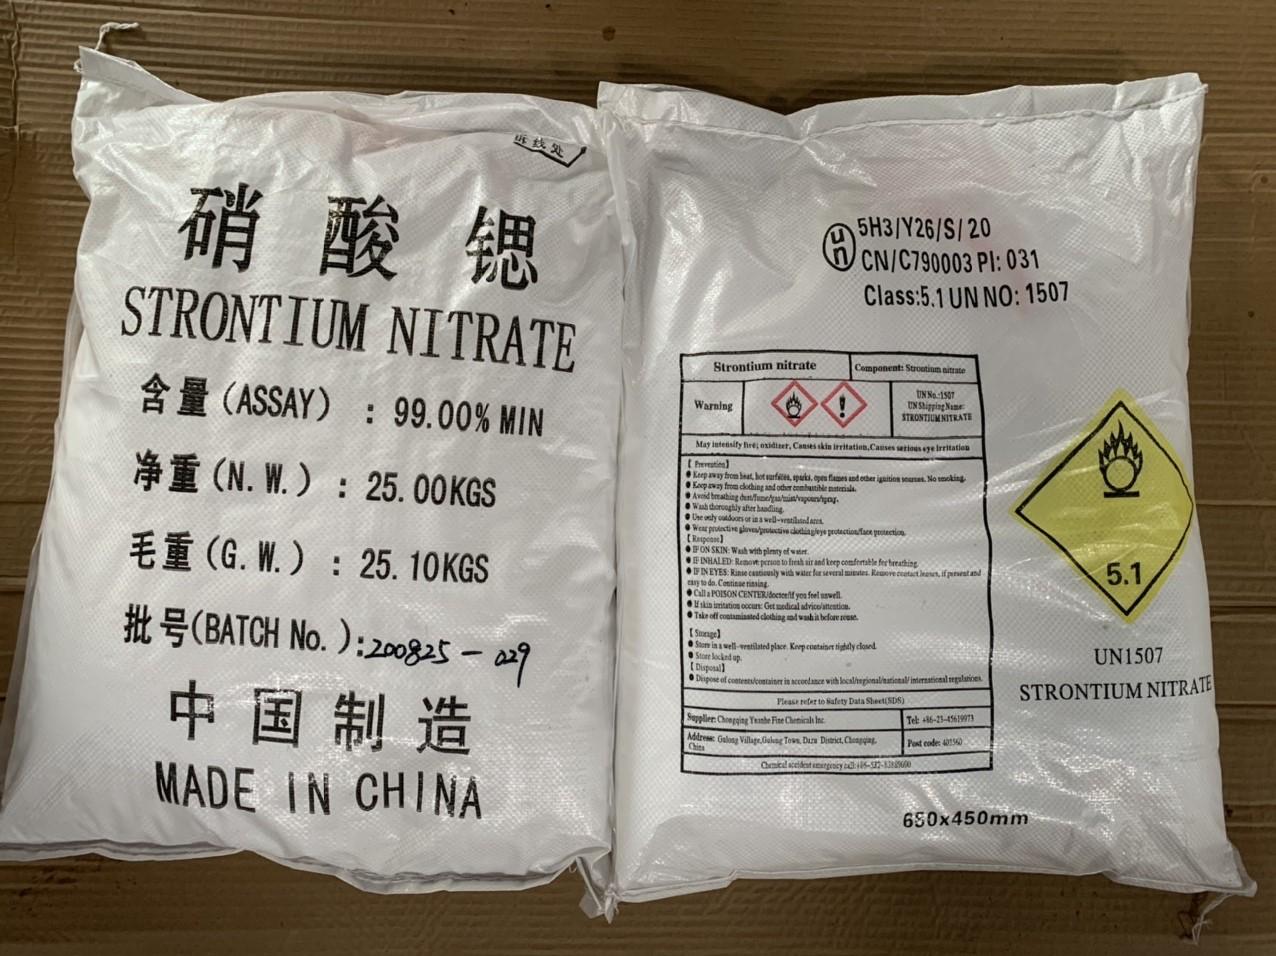 Strontium nitrate - Sr(NO3)2